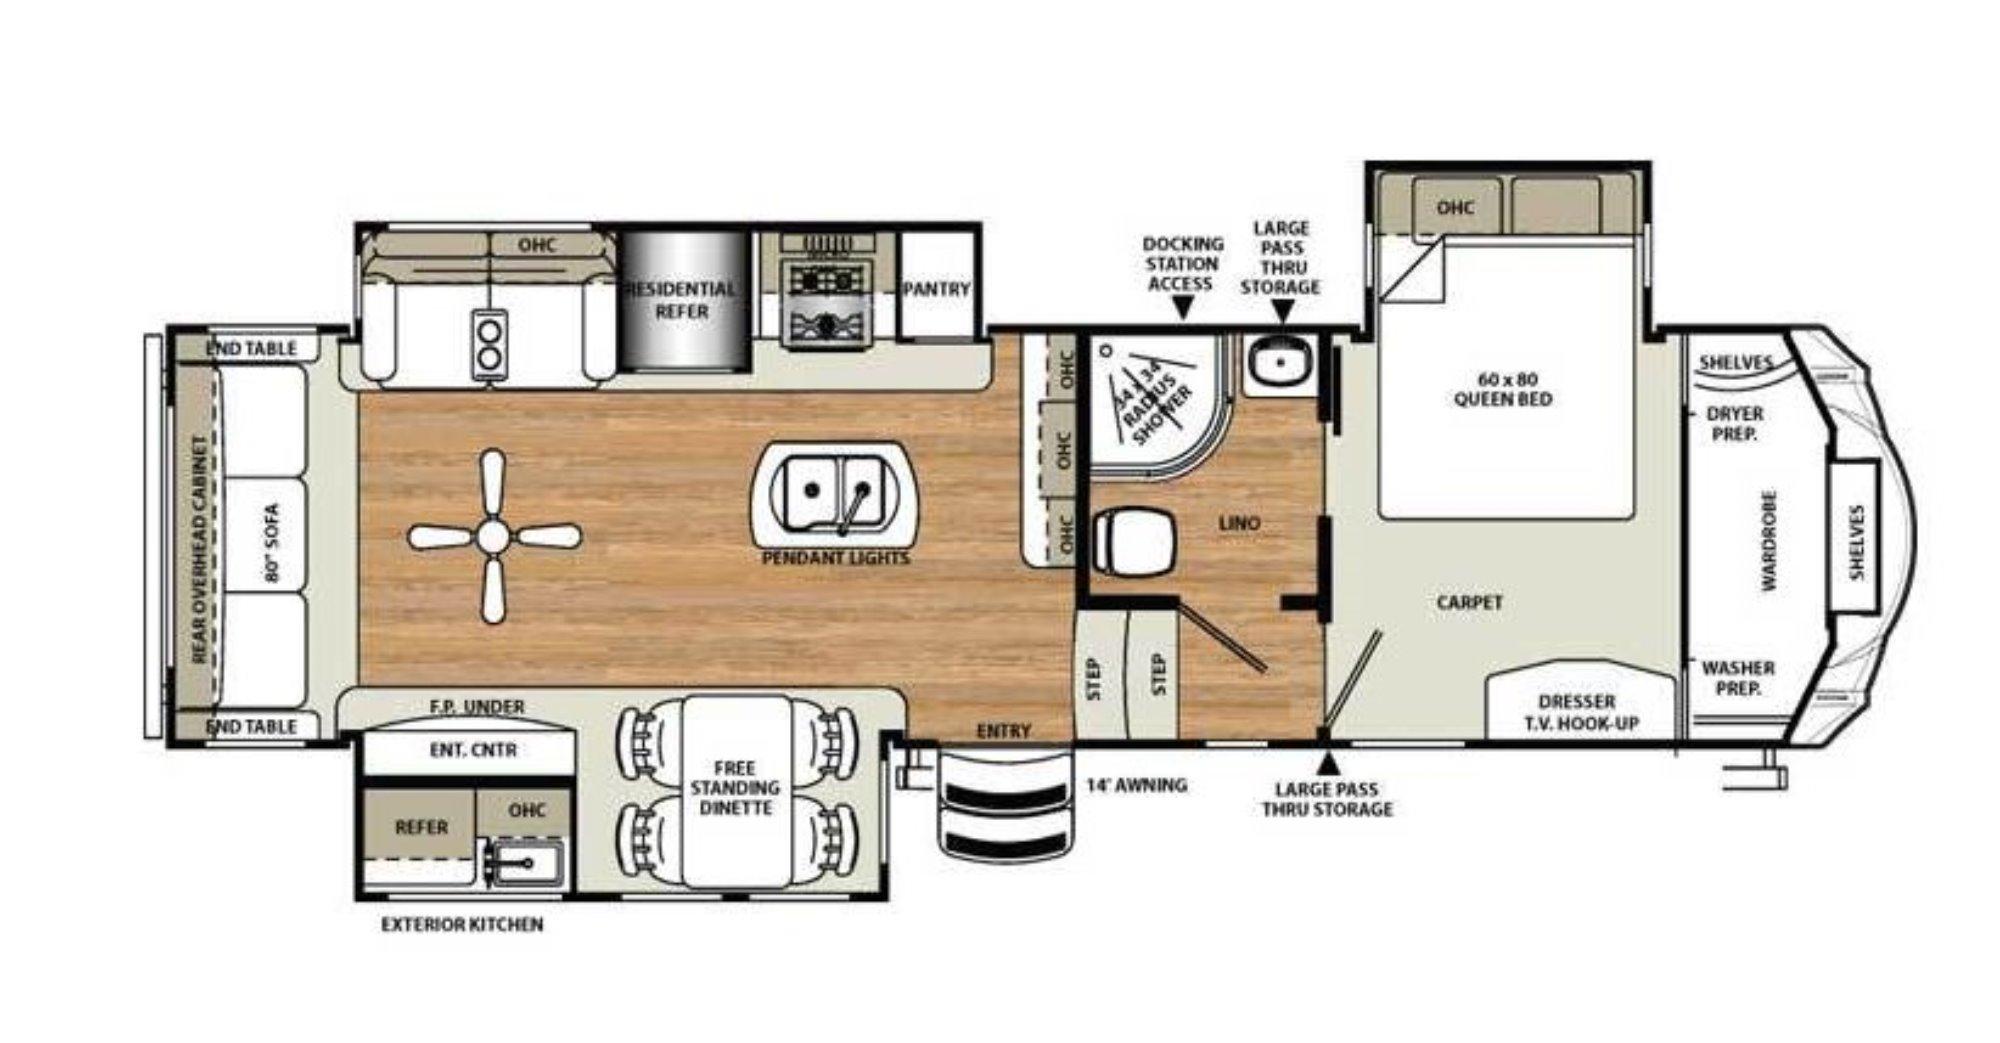 View Floor Plan for 2016 FOREST RIVER SIERRA 343RSOK